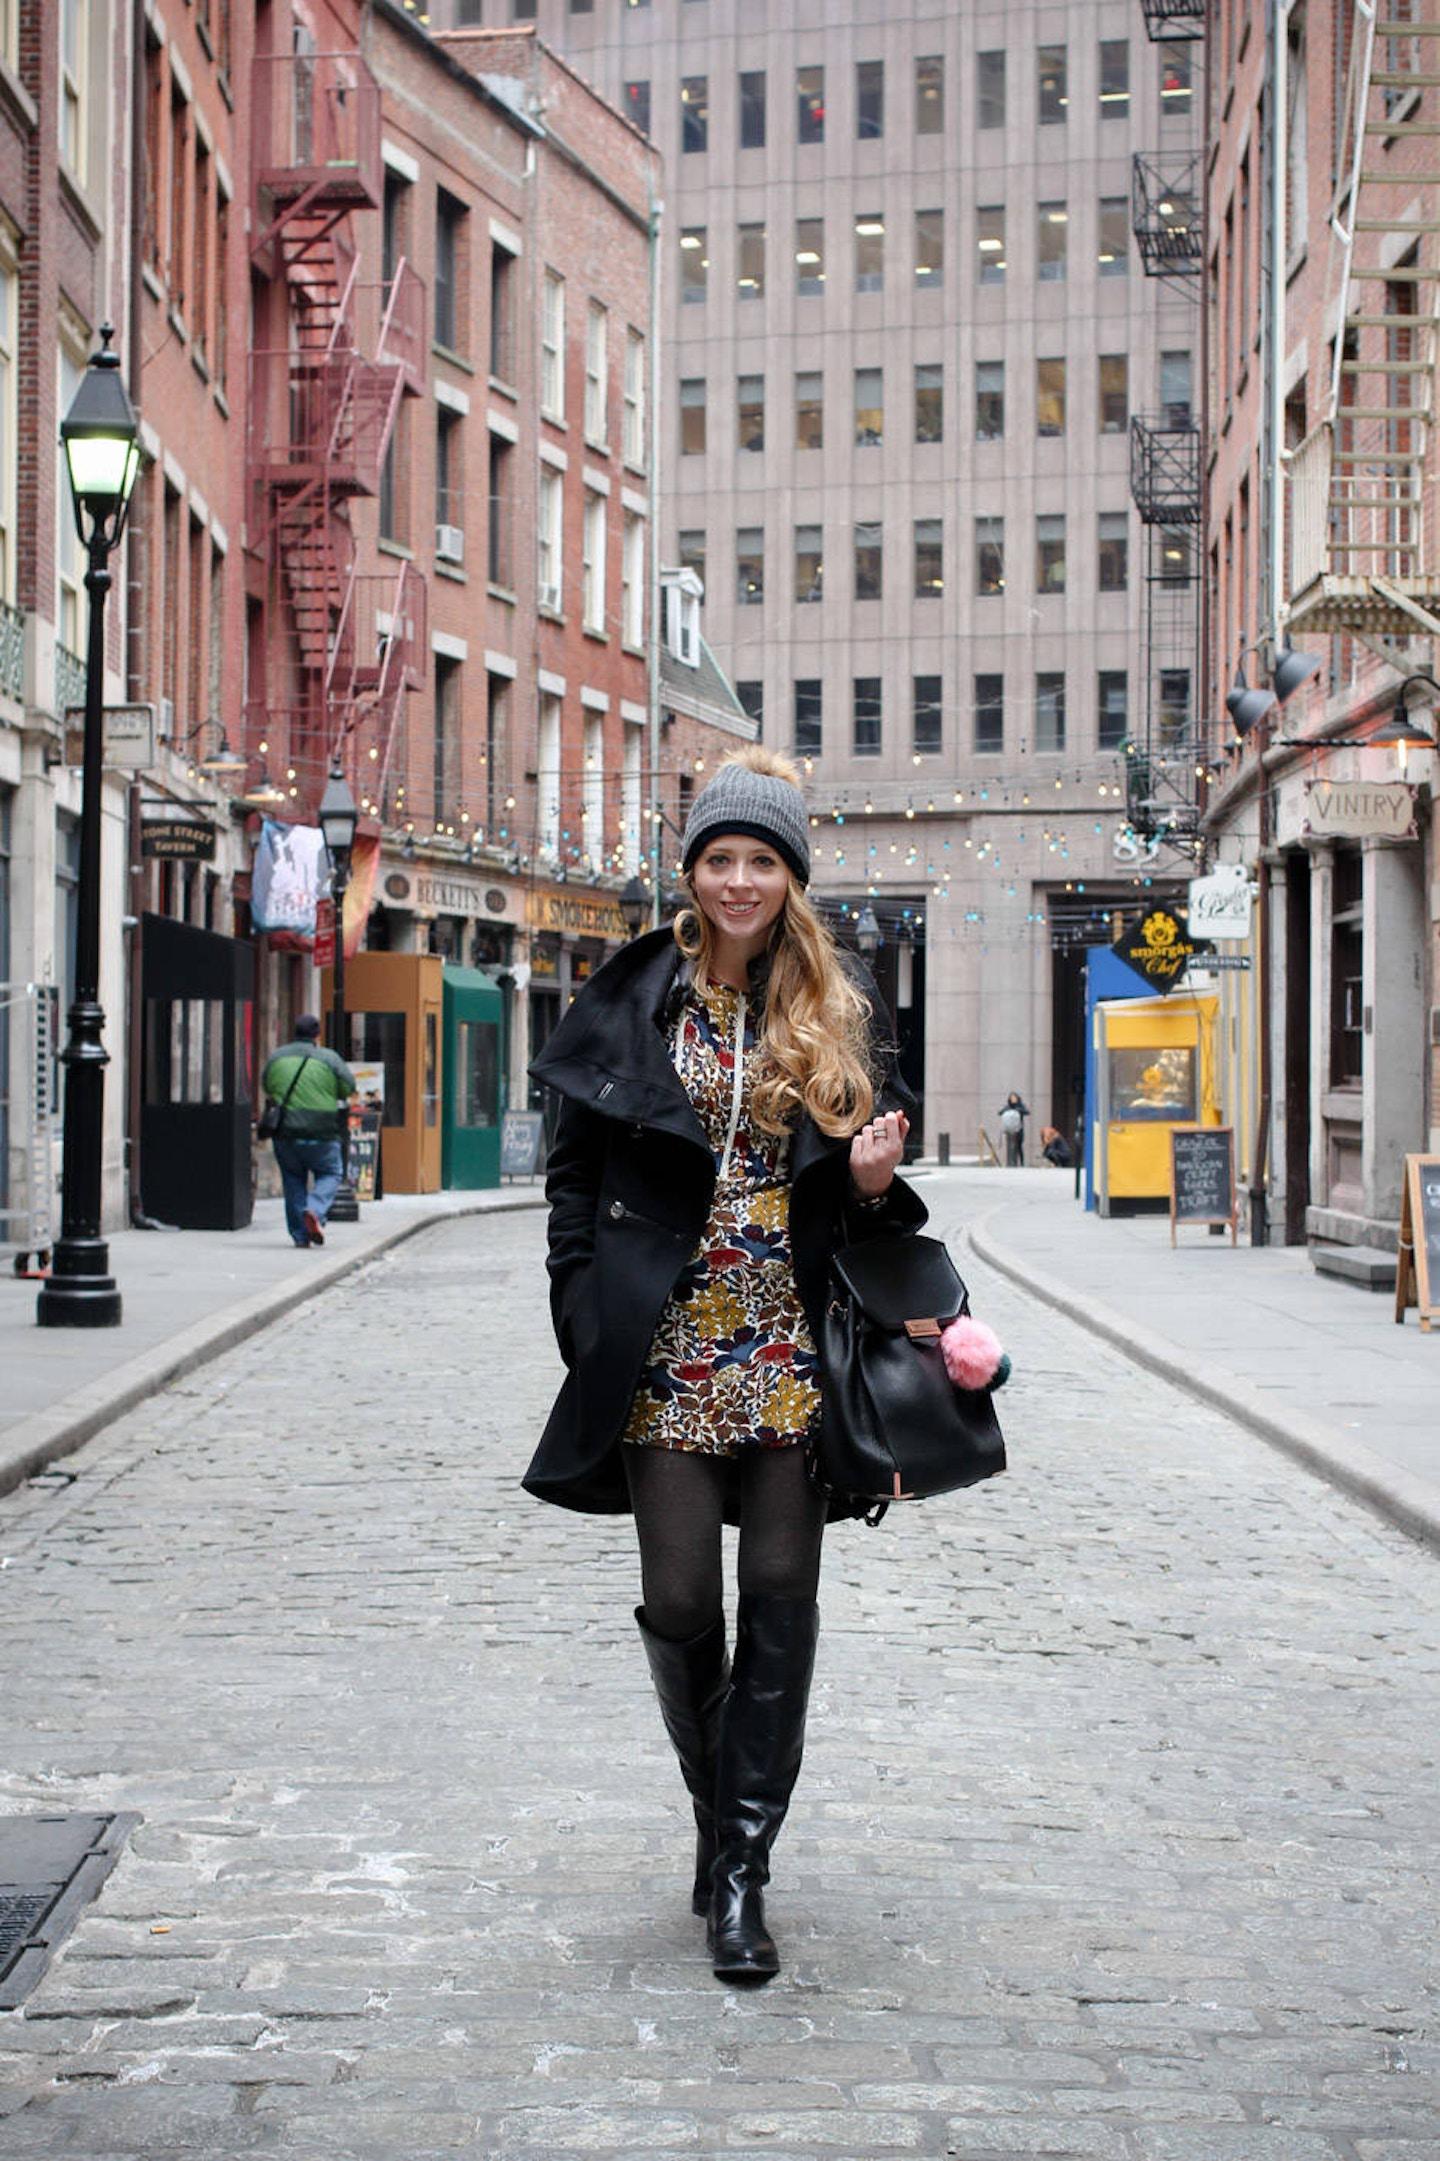 Manhattan Financial District travel guide